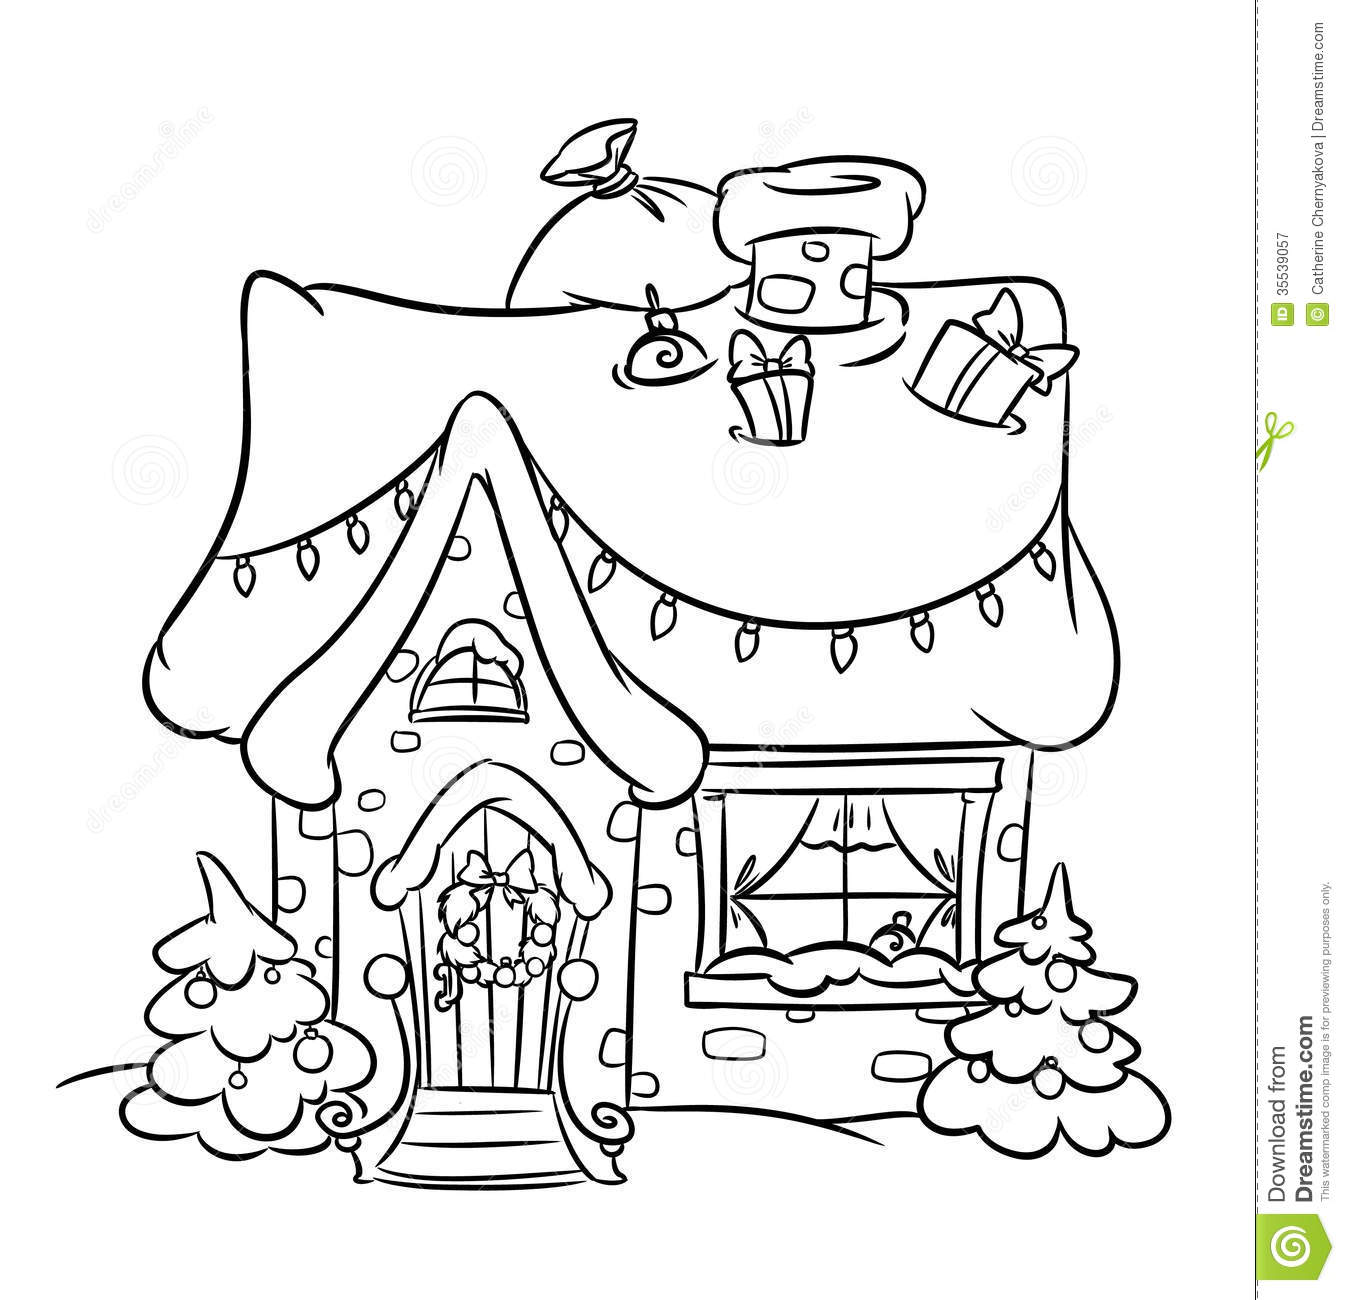 House Cartoon Drawing At Getdrawings